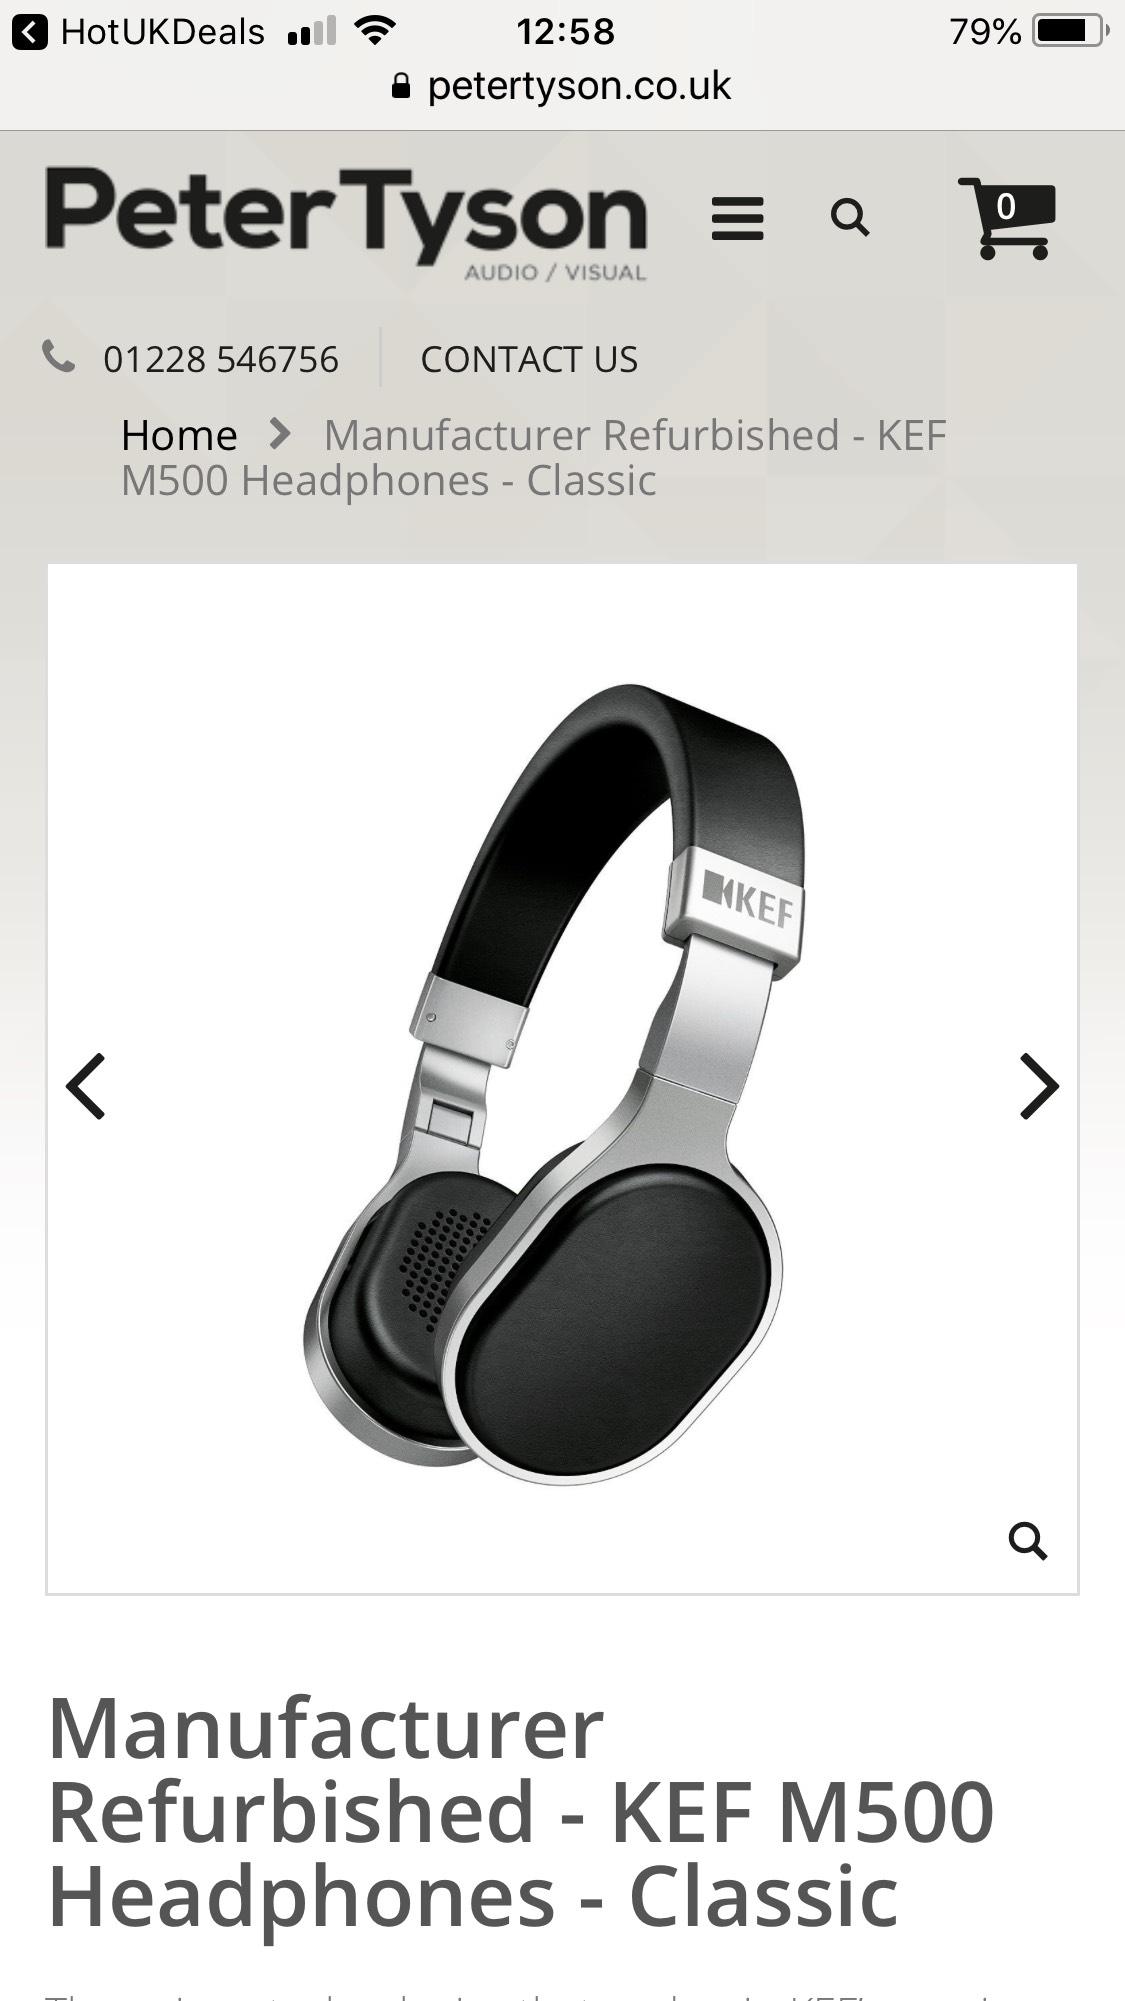 Manufacturer Refurbished - KEF M500 Headphones - Classic 2 year warranty £49 @ Peter Tyson